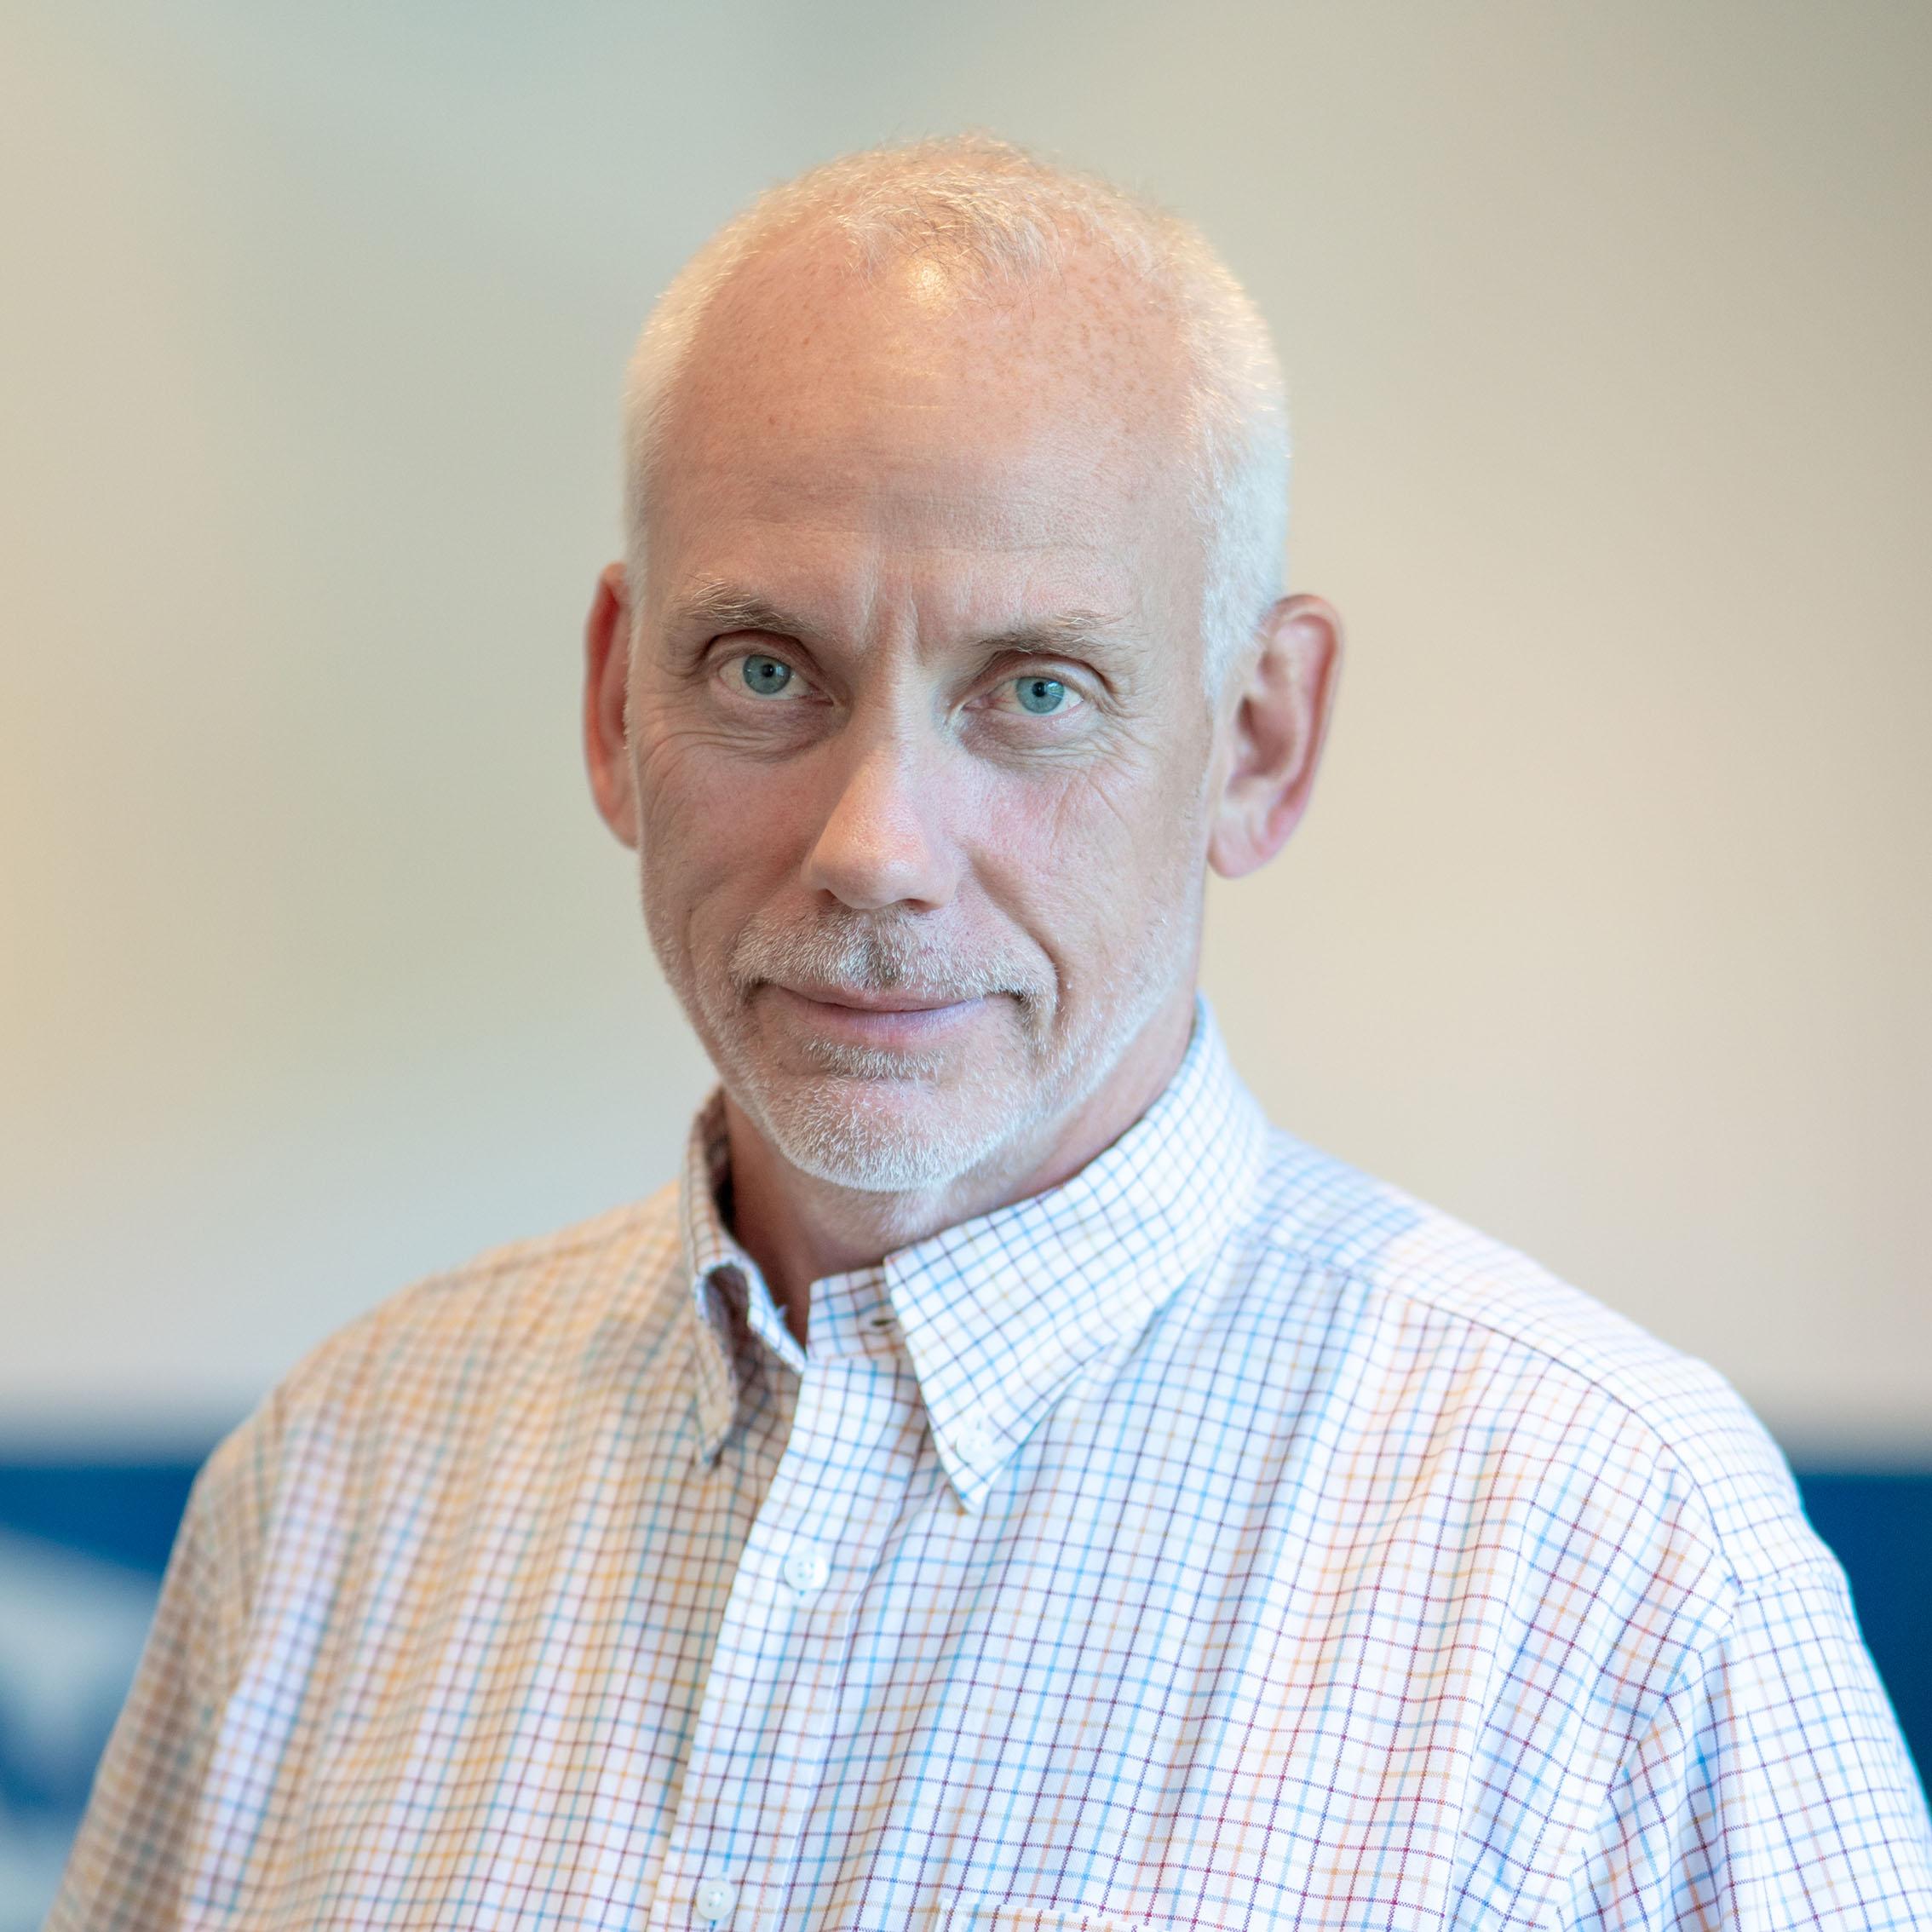 Magnus Karlsson - Personal på Karnag AB